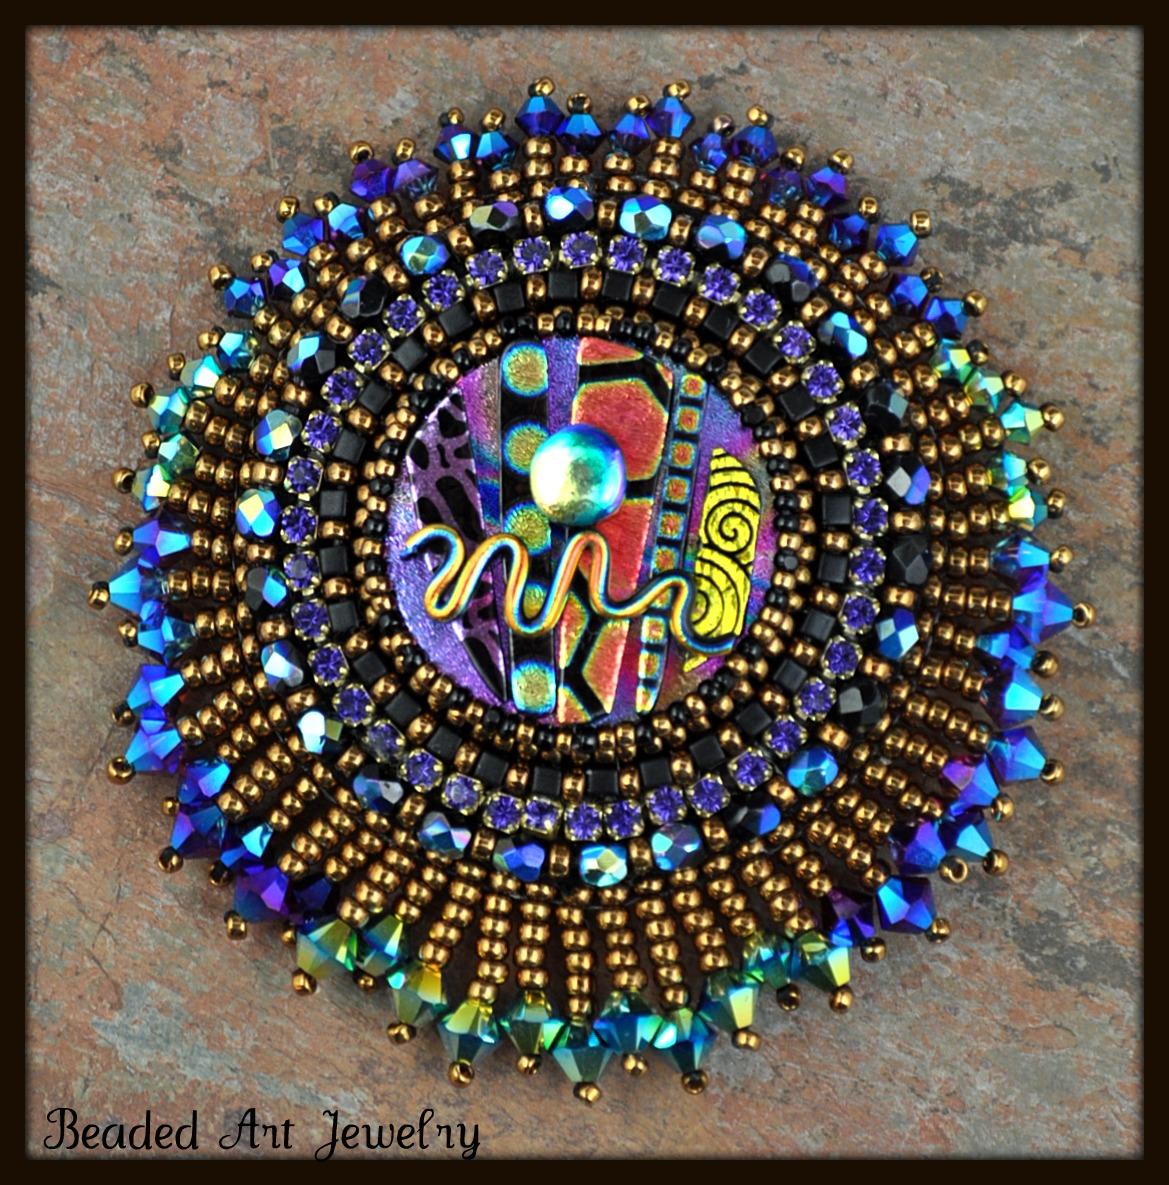 Brooch Beads: Beaded Art Jewelry: Midnight Sun Brooch